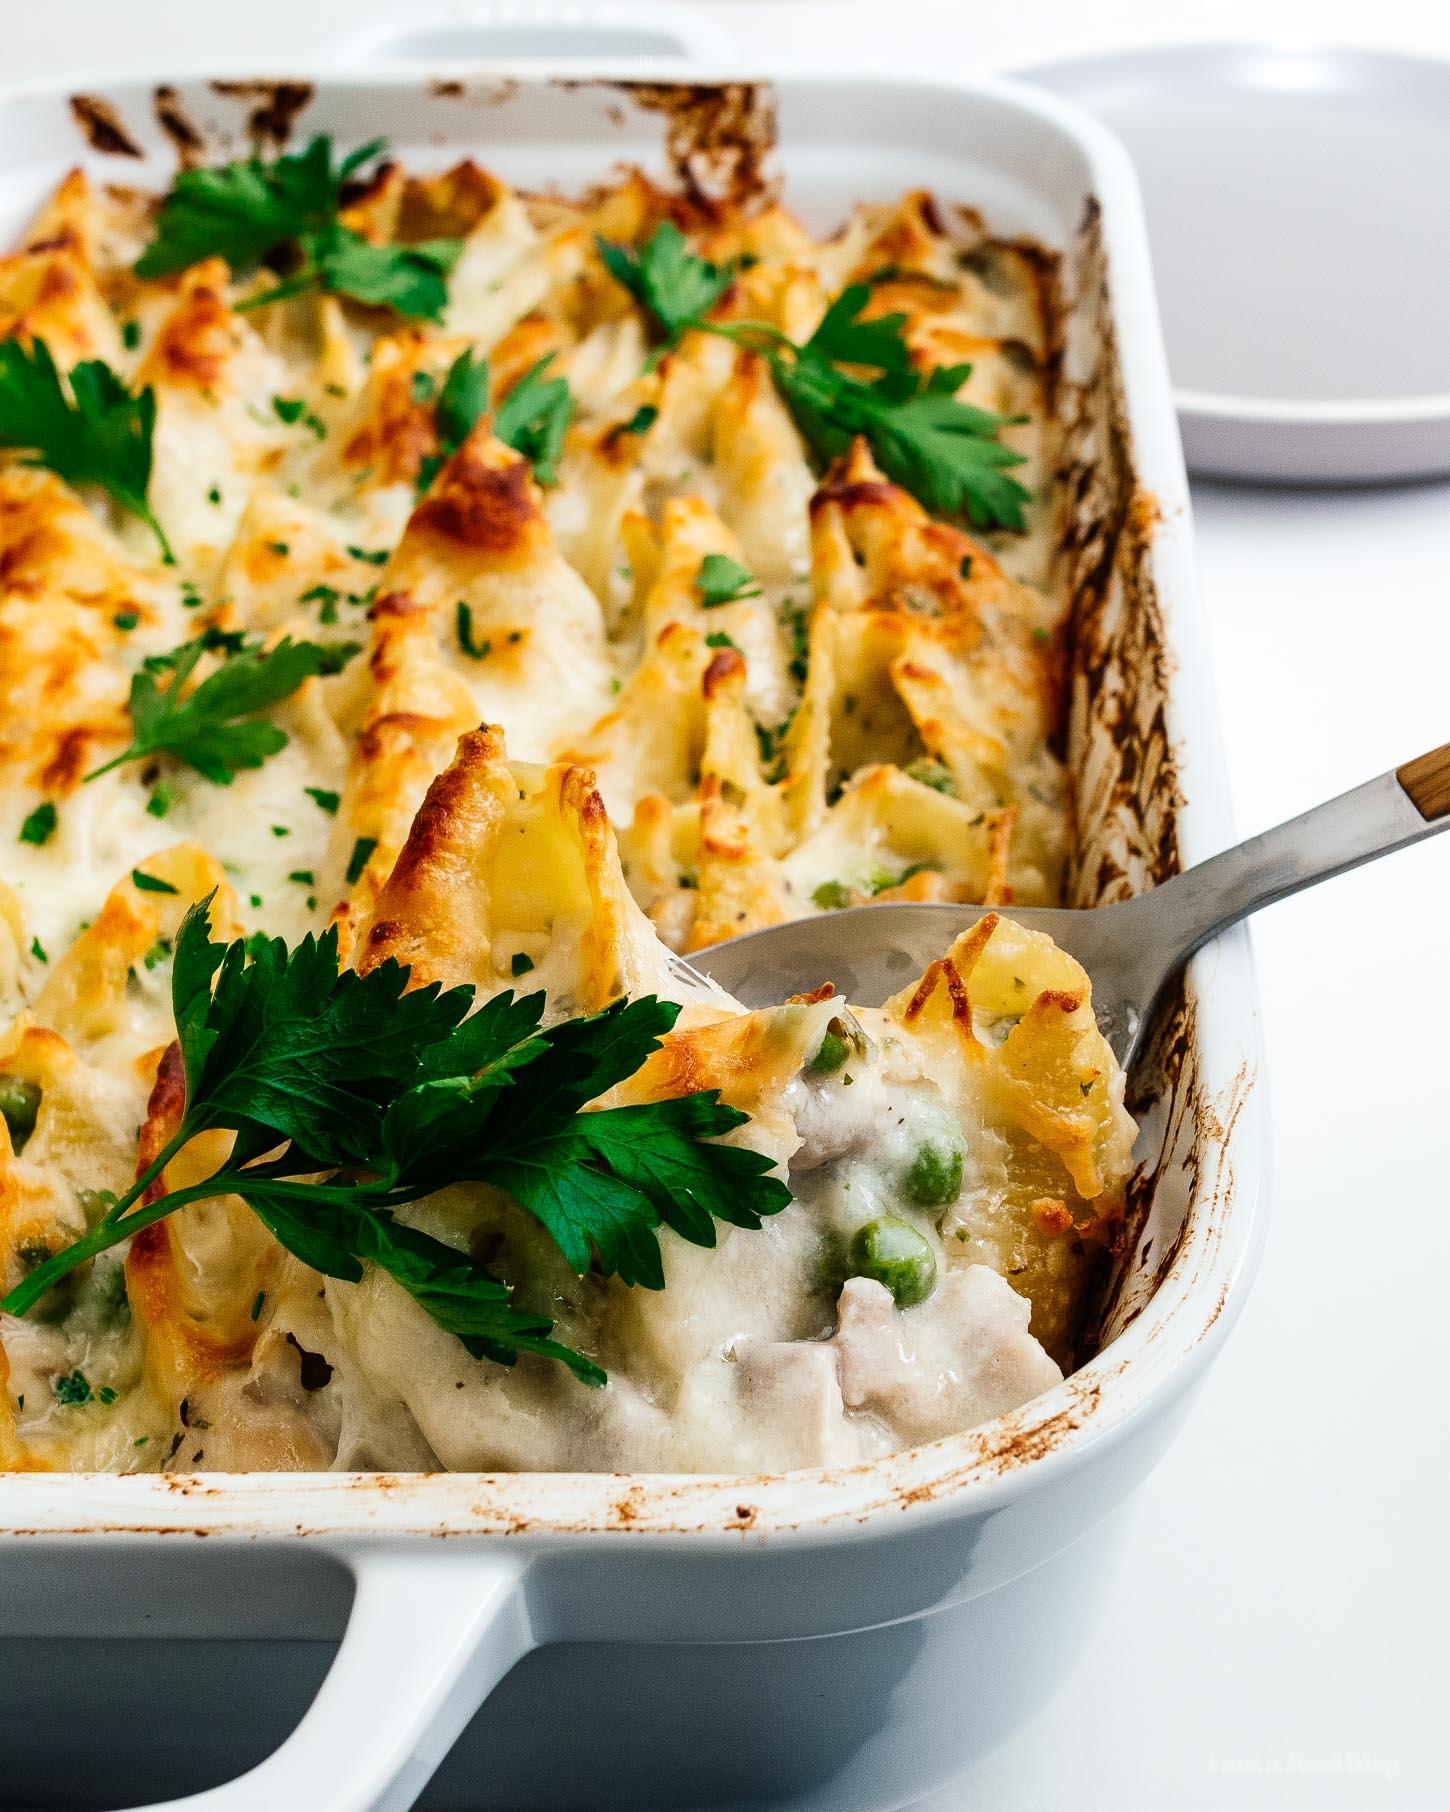 Super warm and comforting oven baked cheesy chicken pot pie stuffed shells #stuffedshells #chicken #chickenpotpie #pasta #noodles #recipe